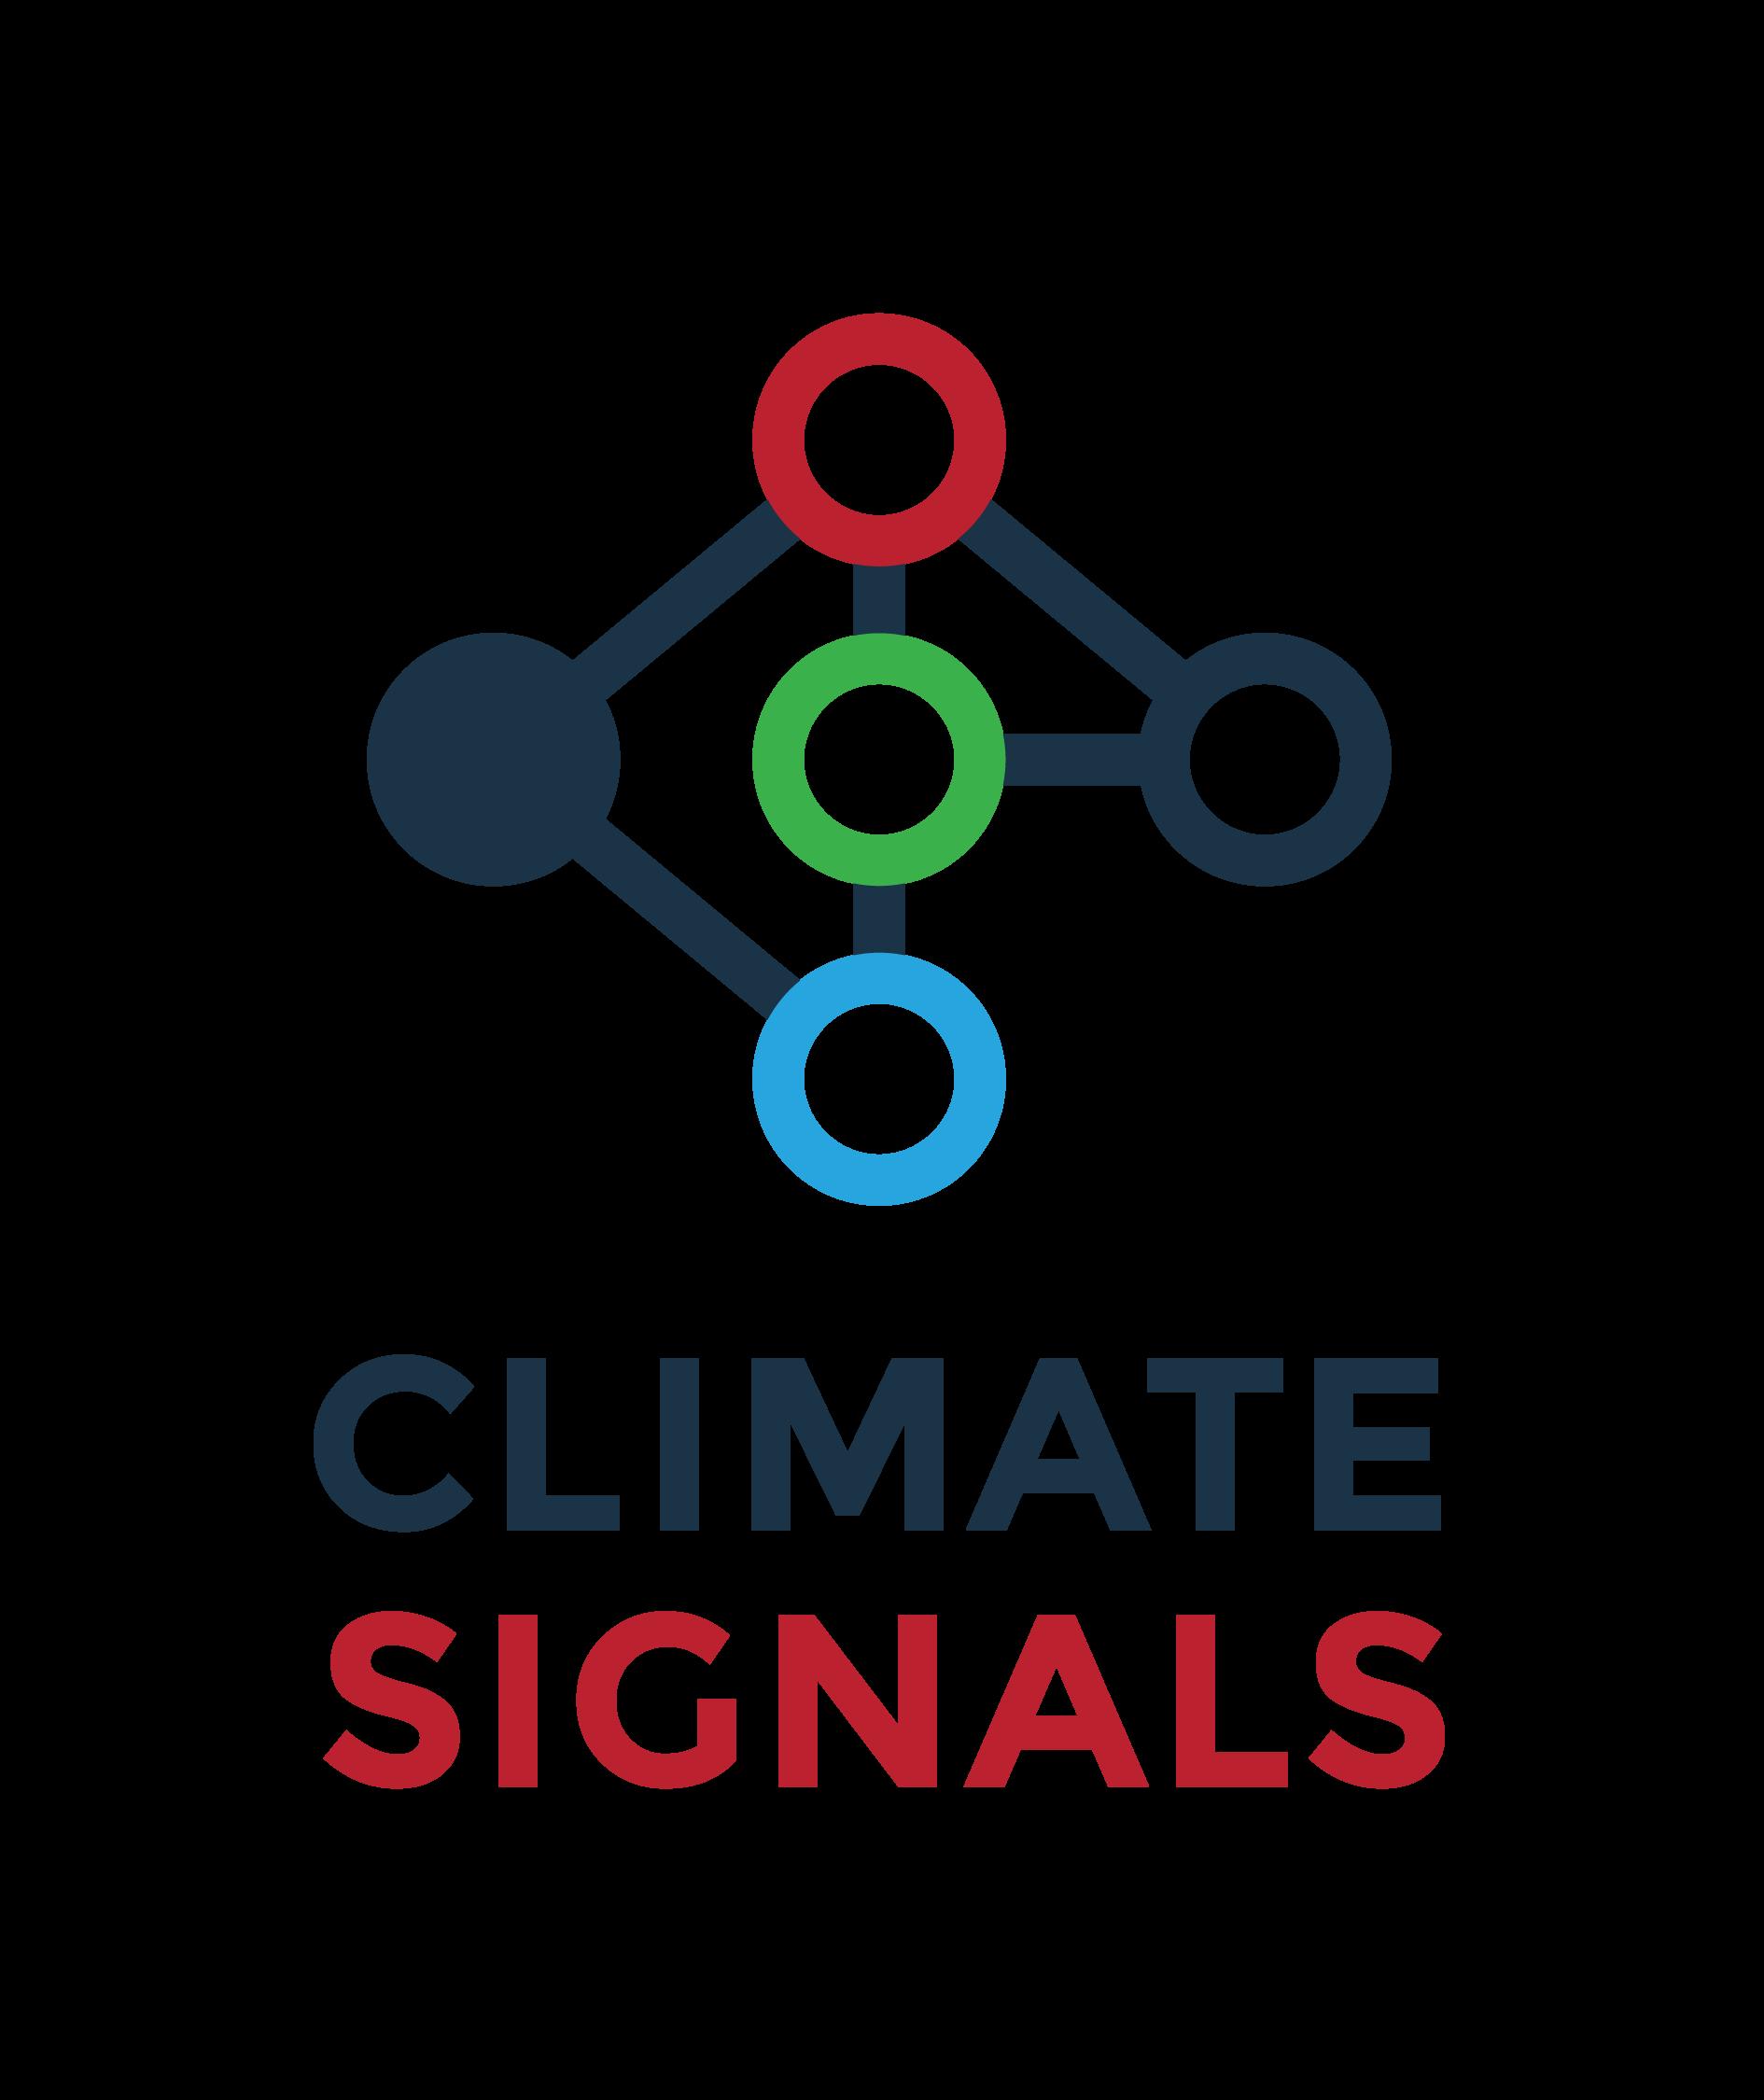 climatesignals-vert (1).png